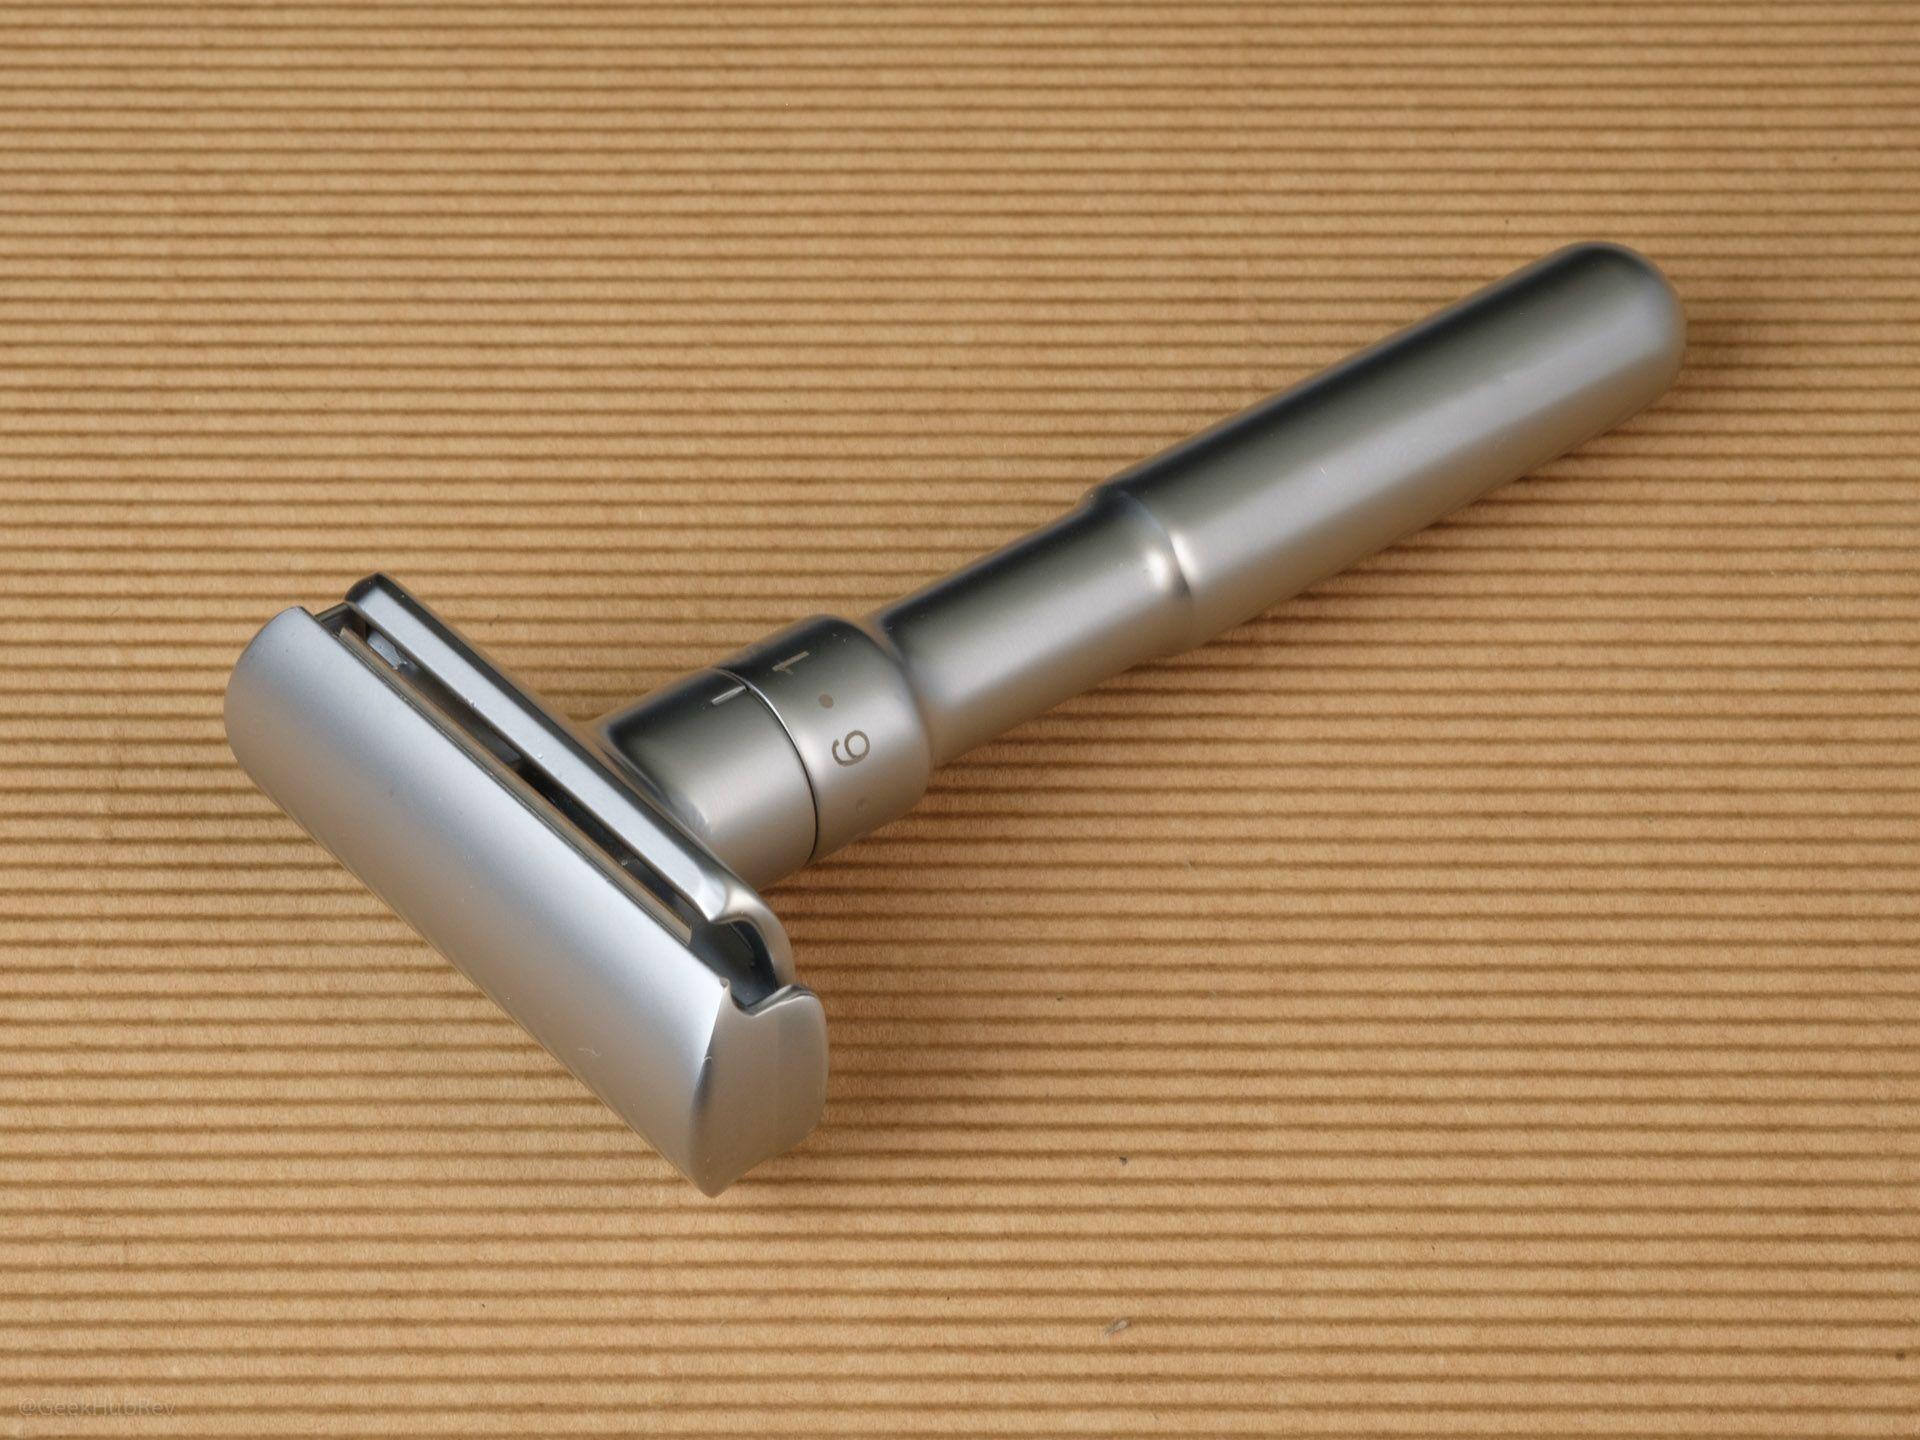 You are currently viewing Ming Shi Shaver 2000S (a.k.a. chiński Futur) – recenzja regulowanej maszynki do golenia